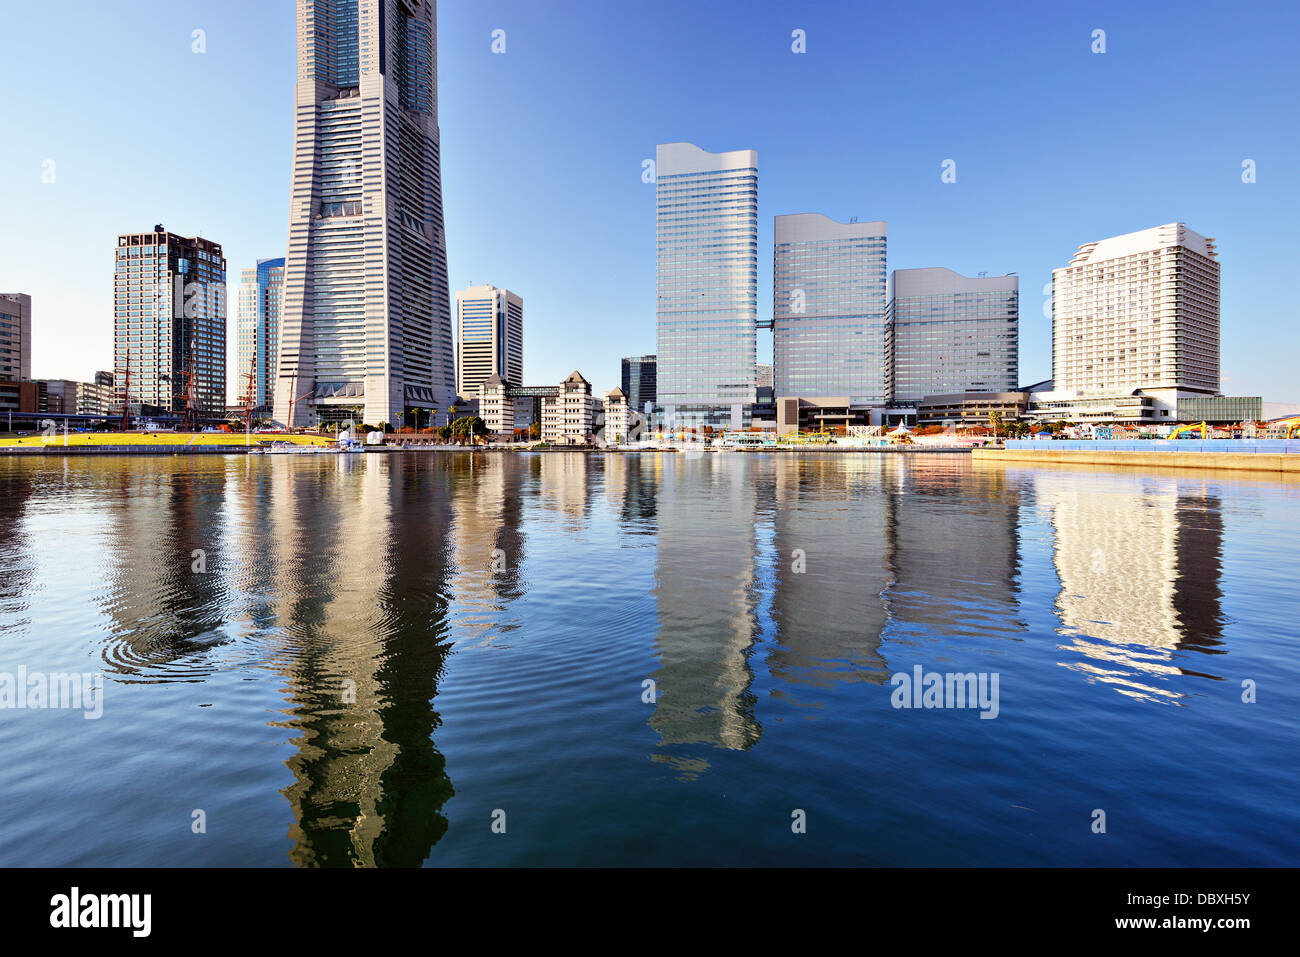 Yokohama, Giappone skyline a Minato-mirai. Immagini Stock